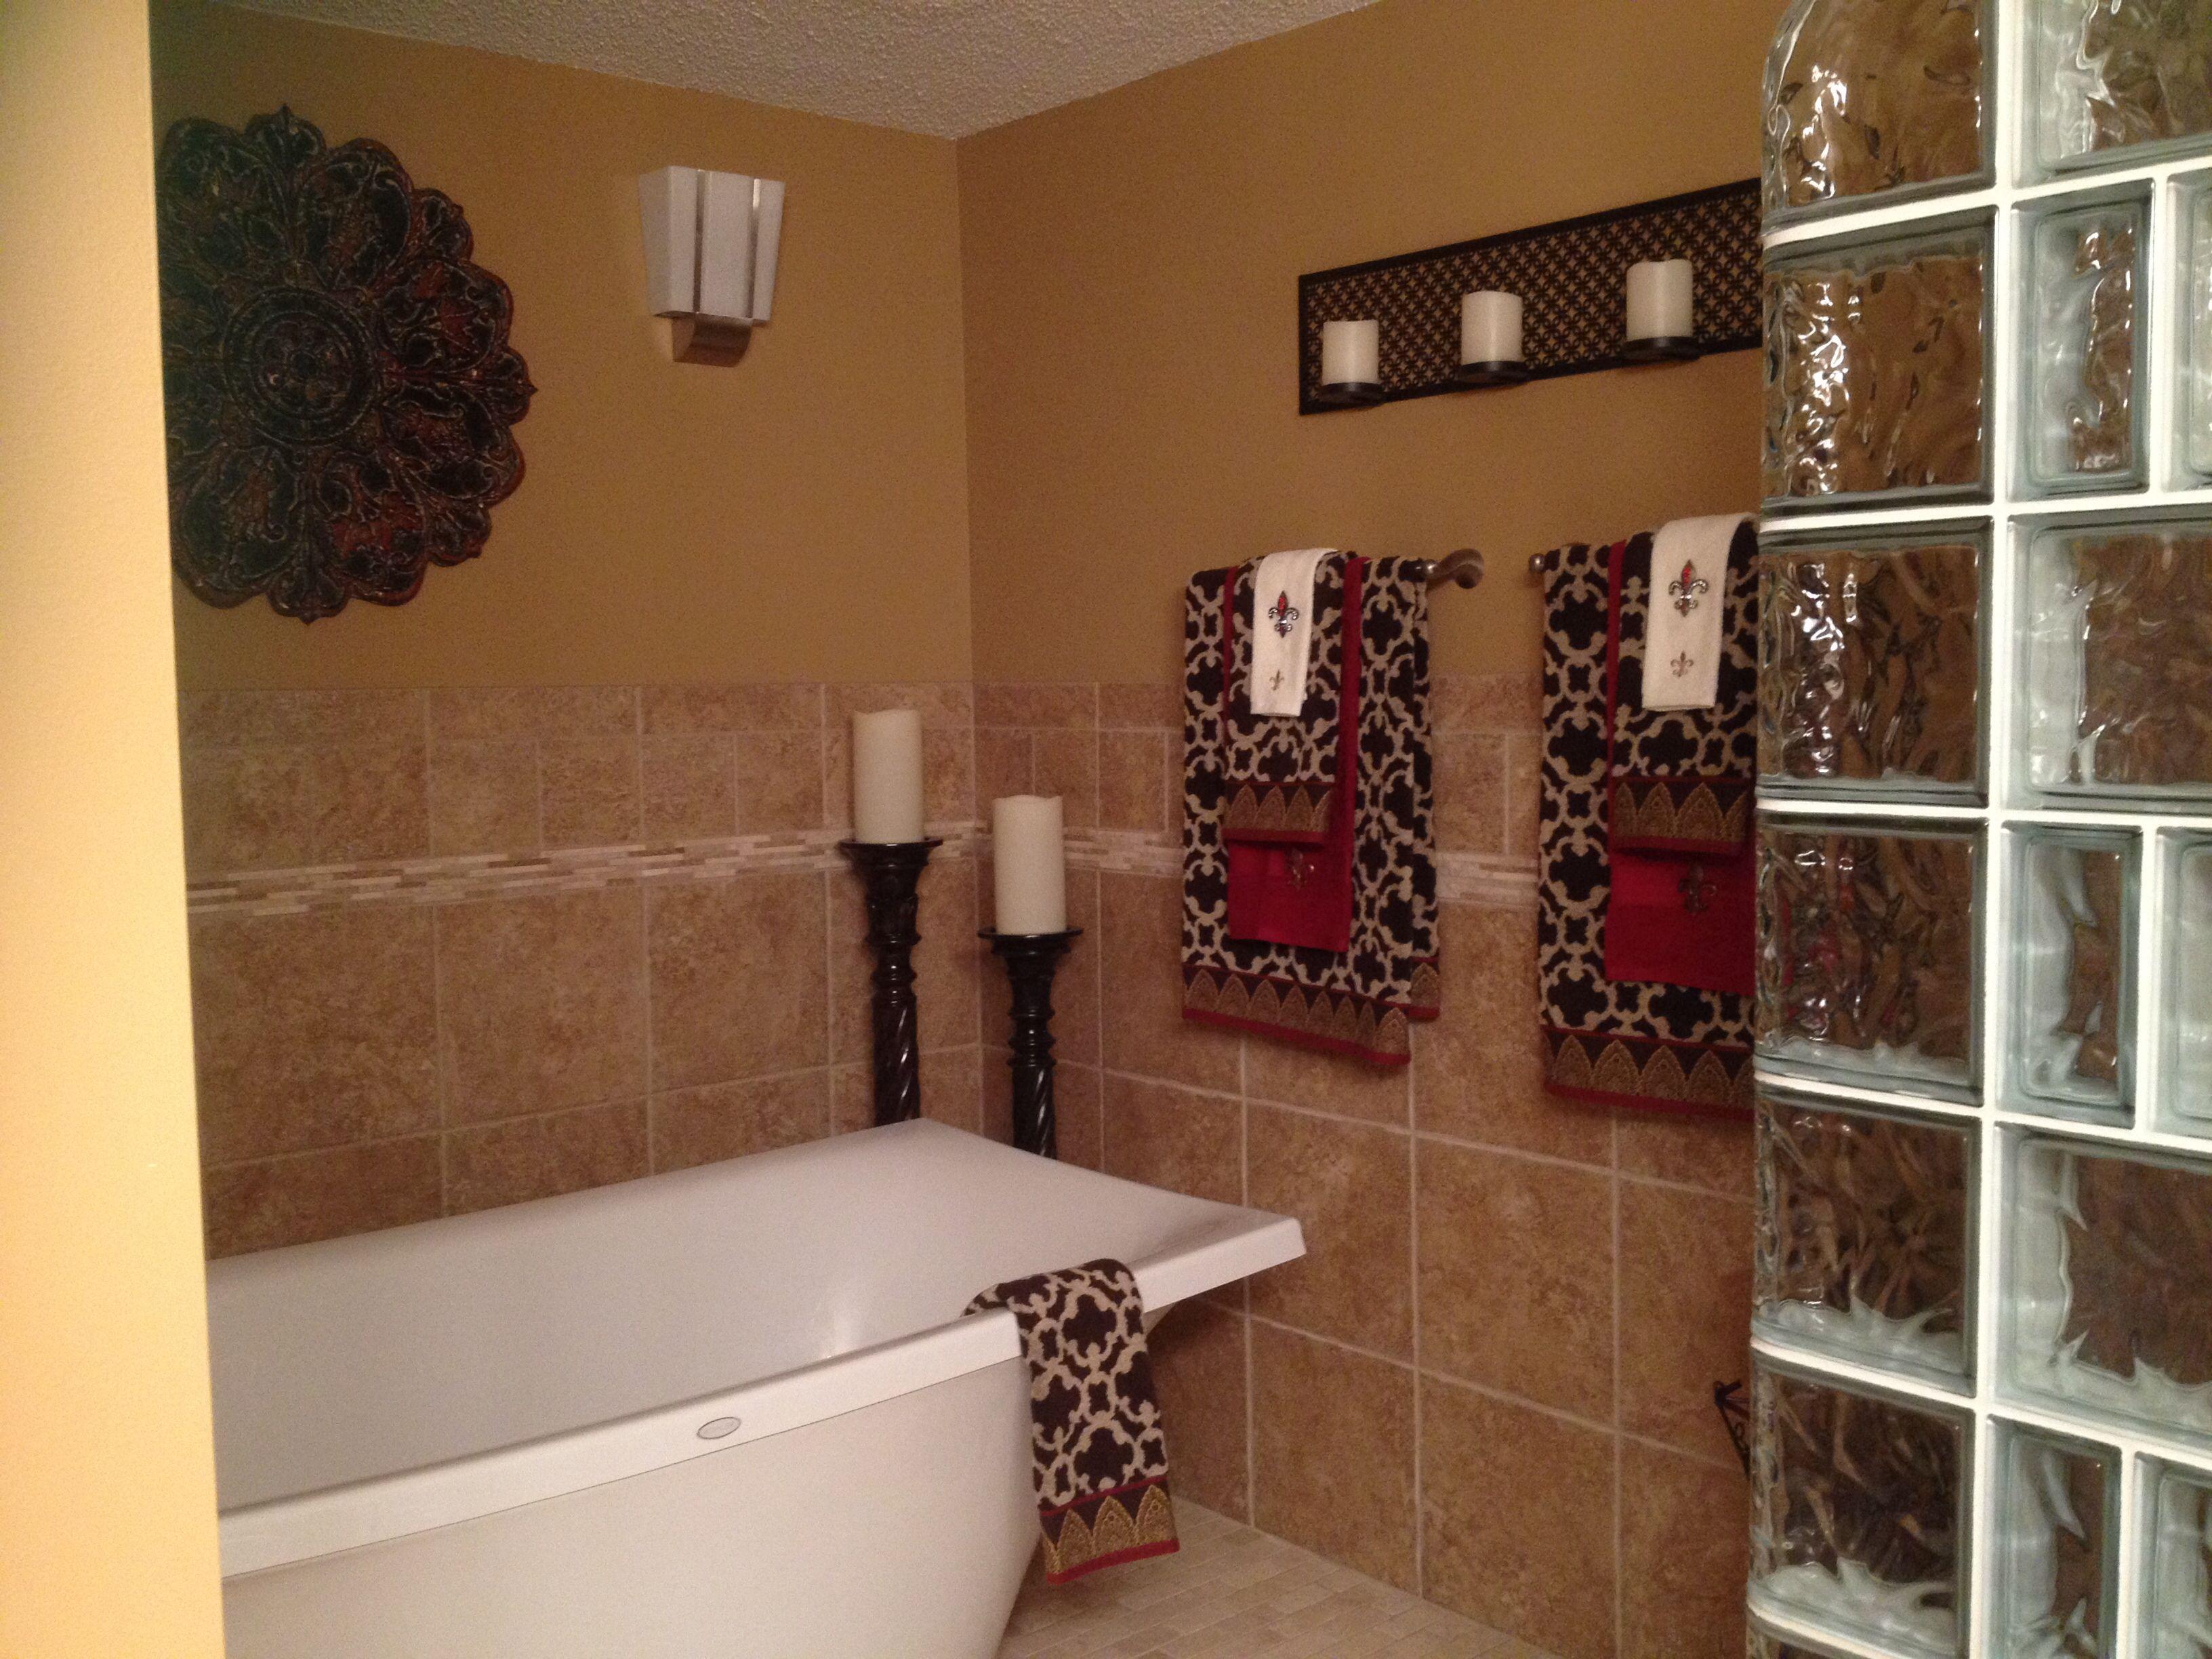 Pin By Terra Skinner On Home Deco Tan Bathroom Decor Tan Bathroom Bathroom Decor